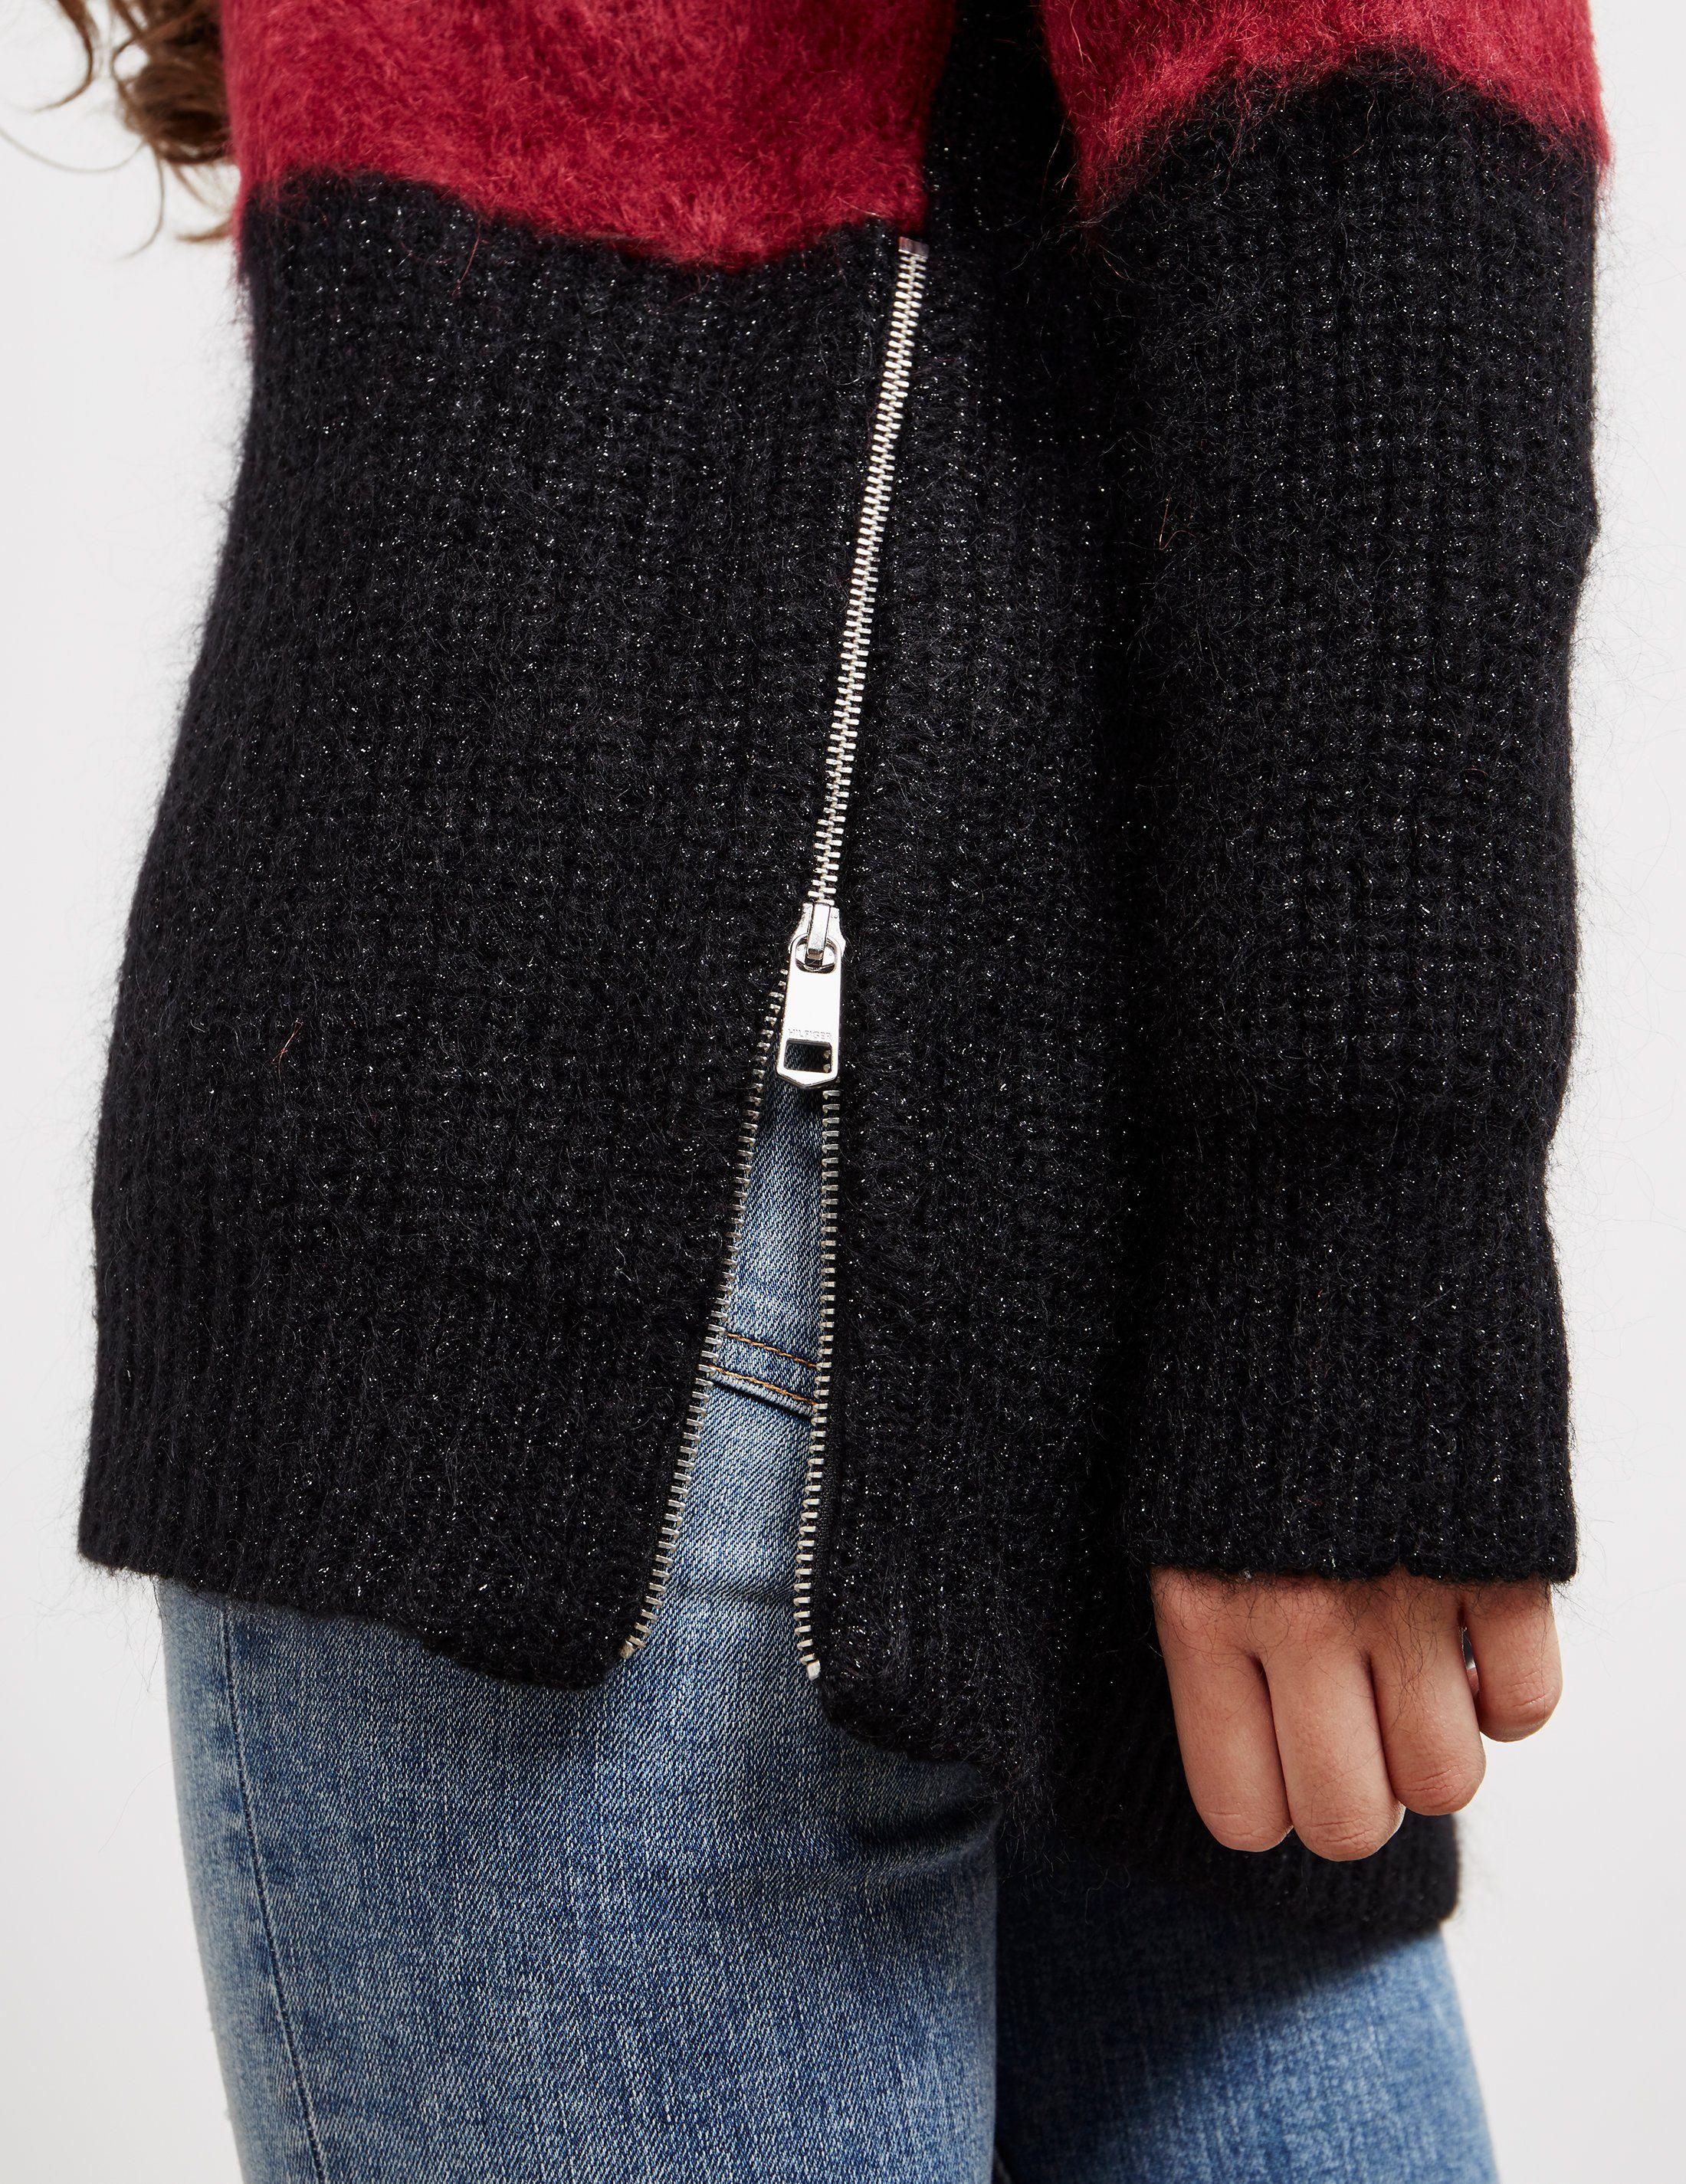 Tommy Hilfiger Icon Flag Knit Jumper